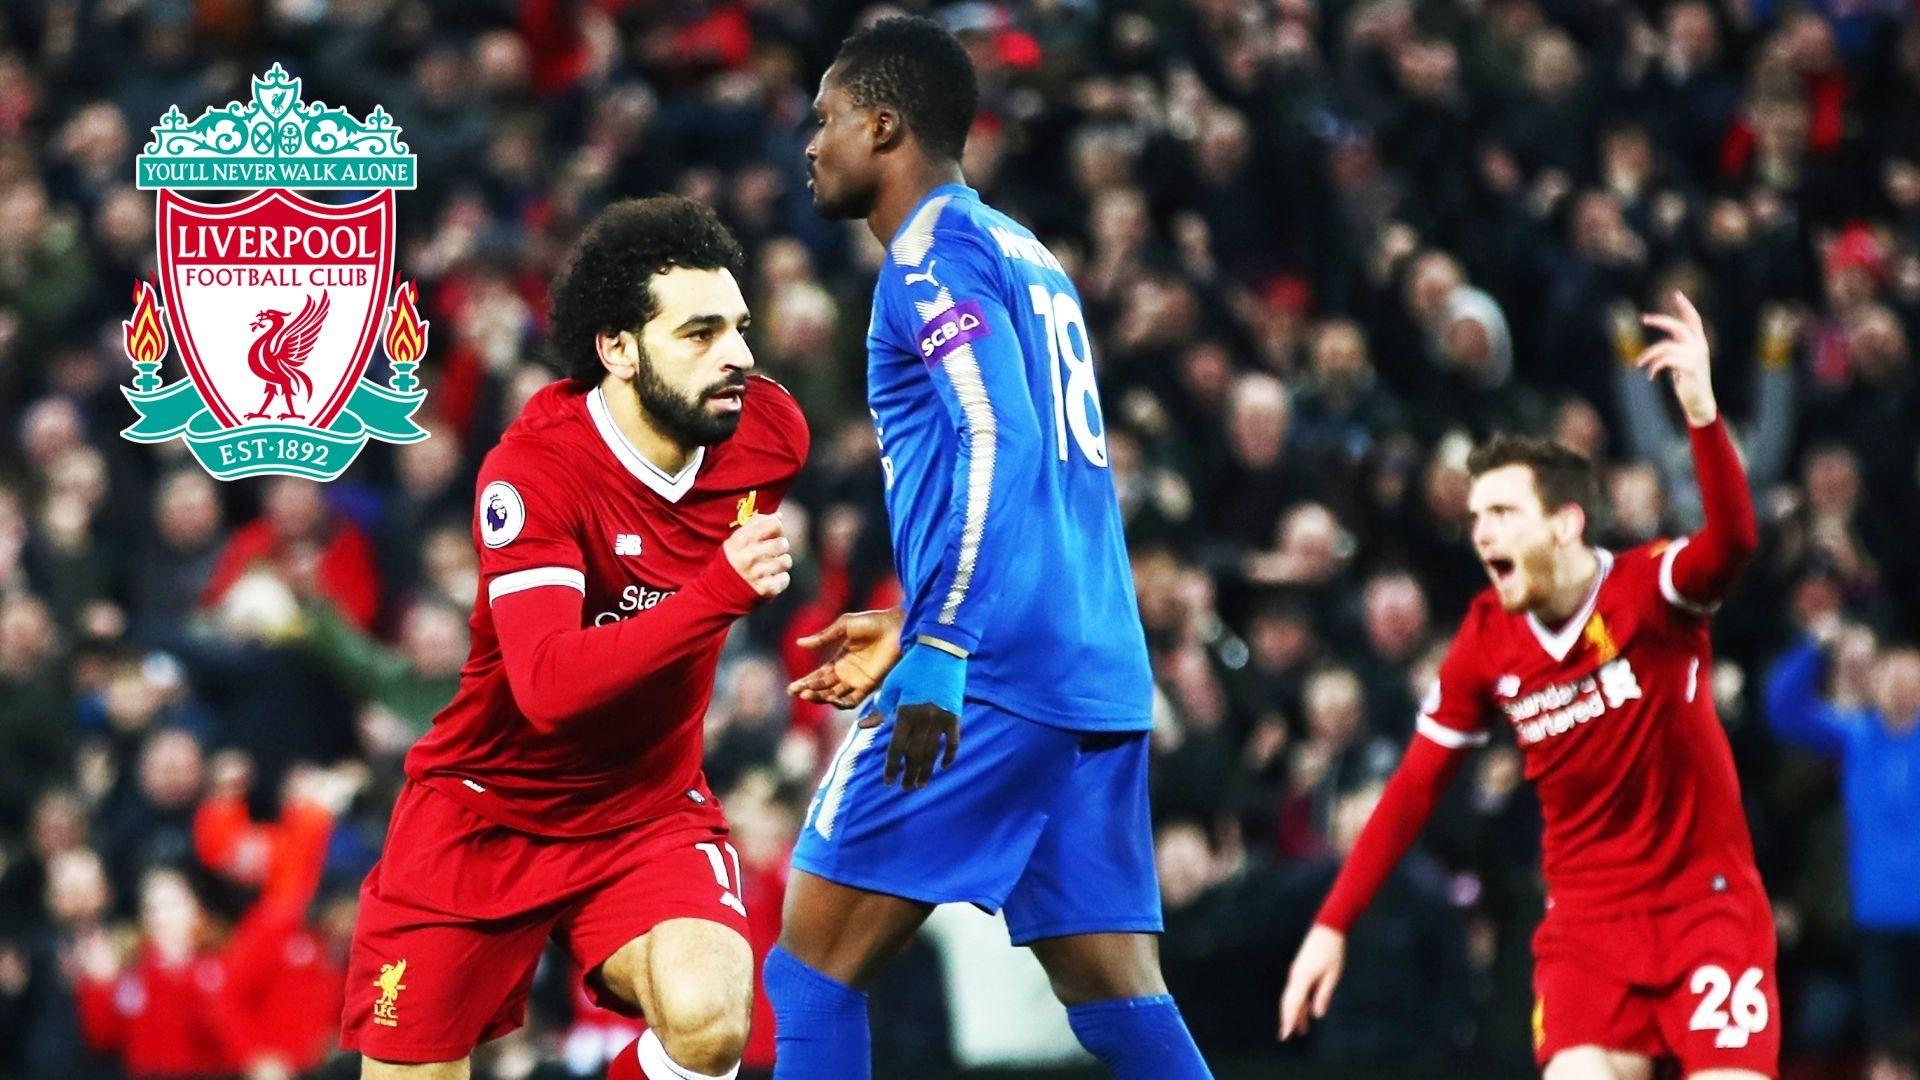 Mohamed Salah Liverpool HD Backgrounds